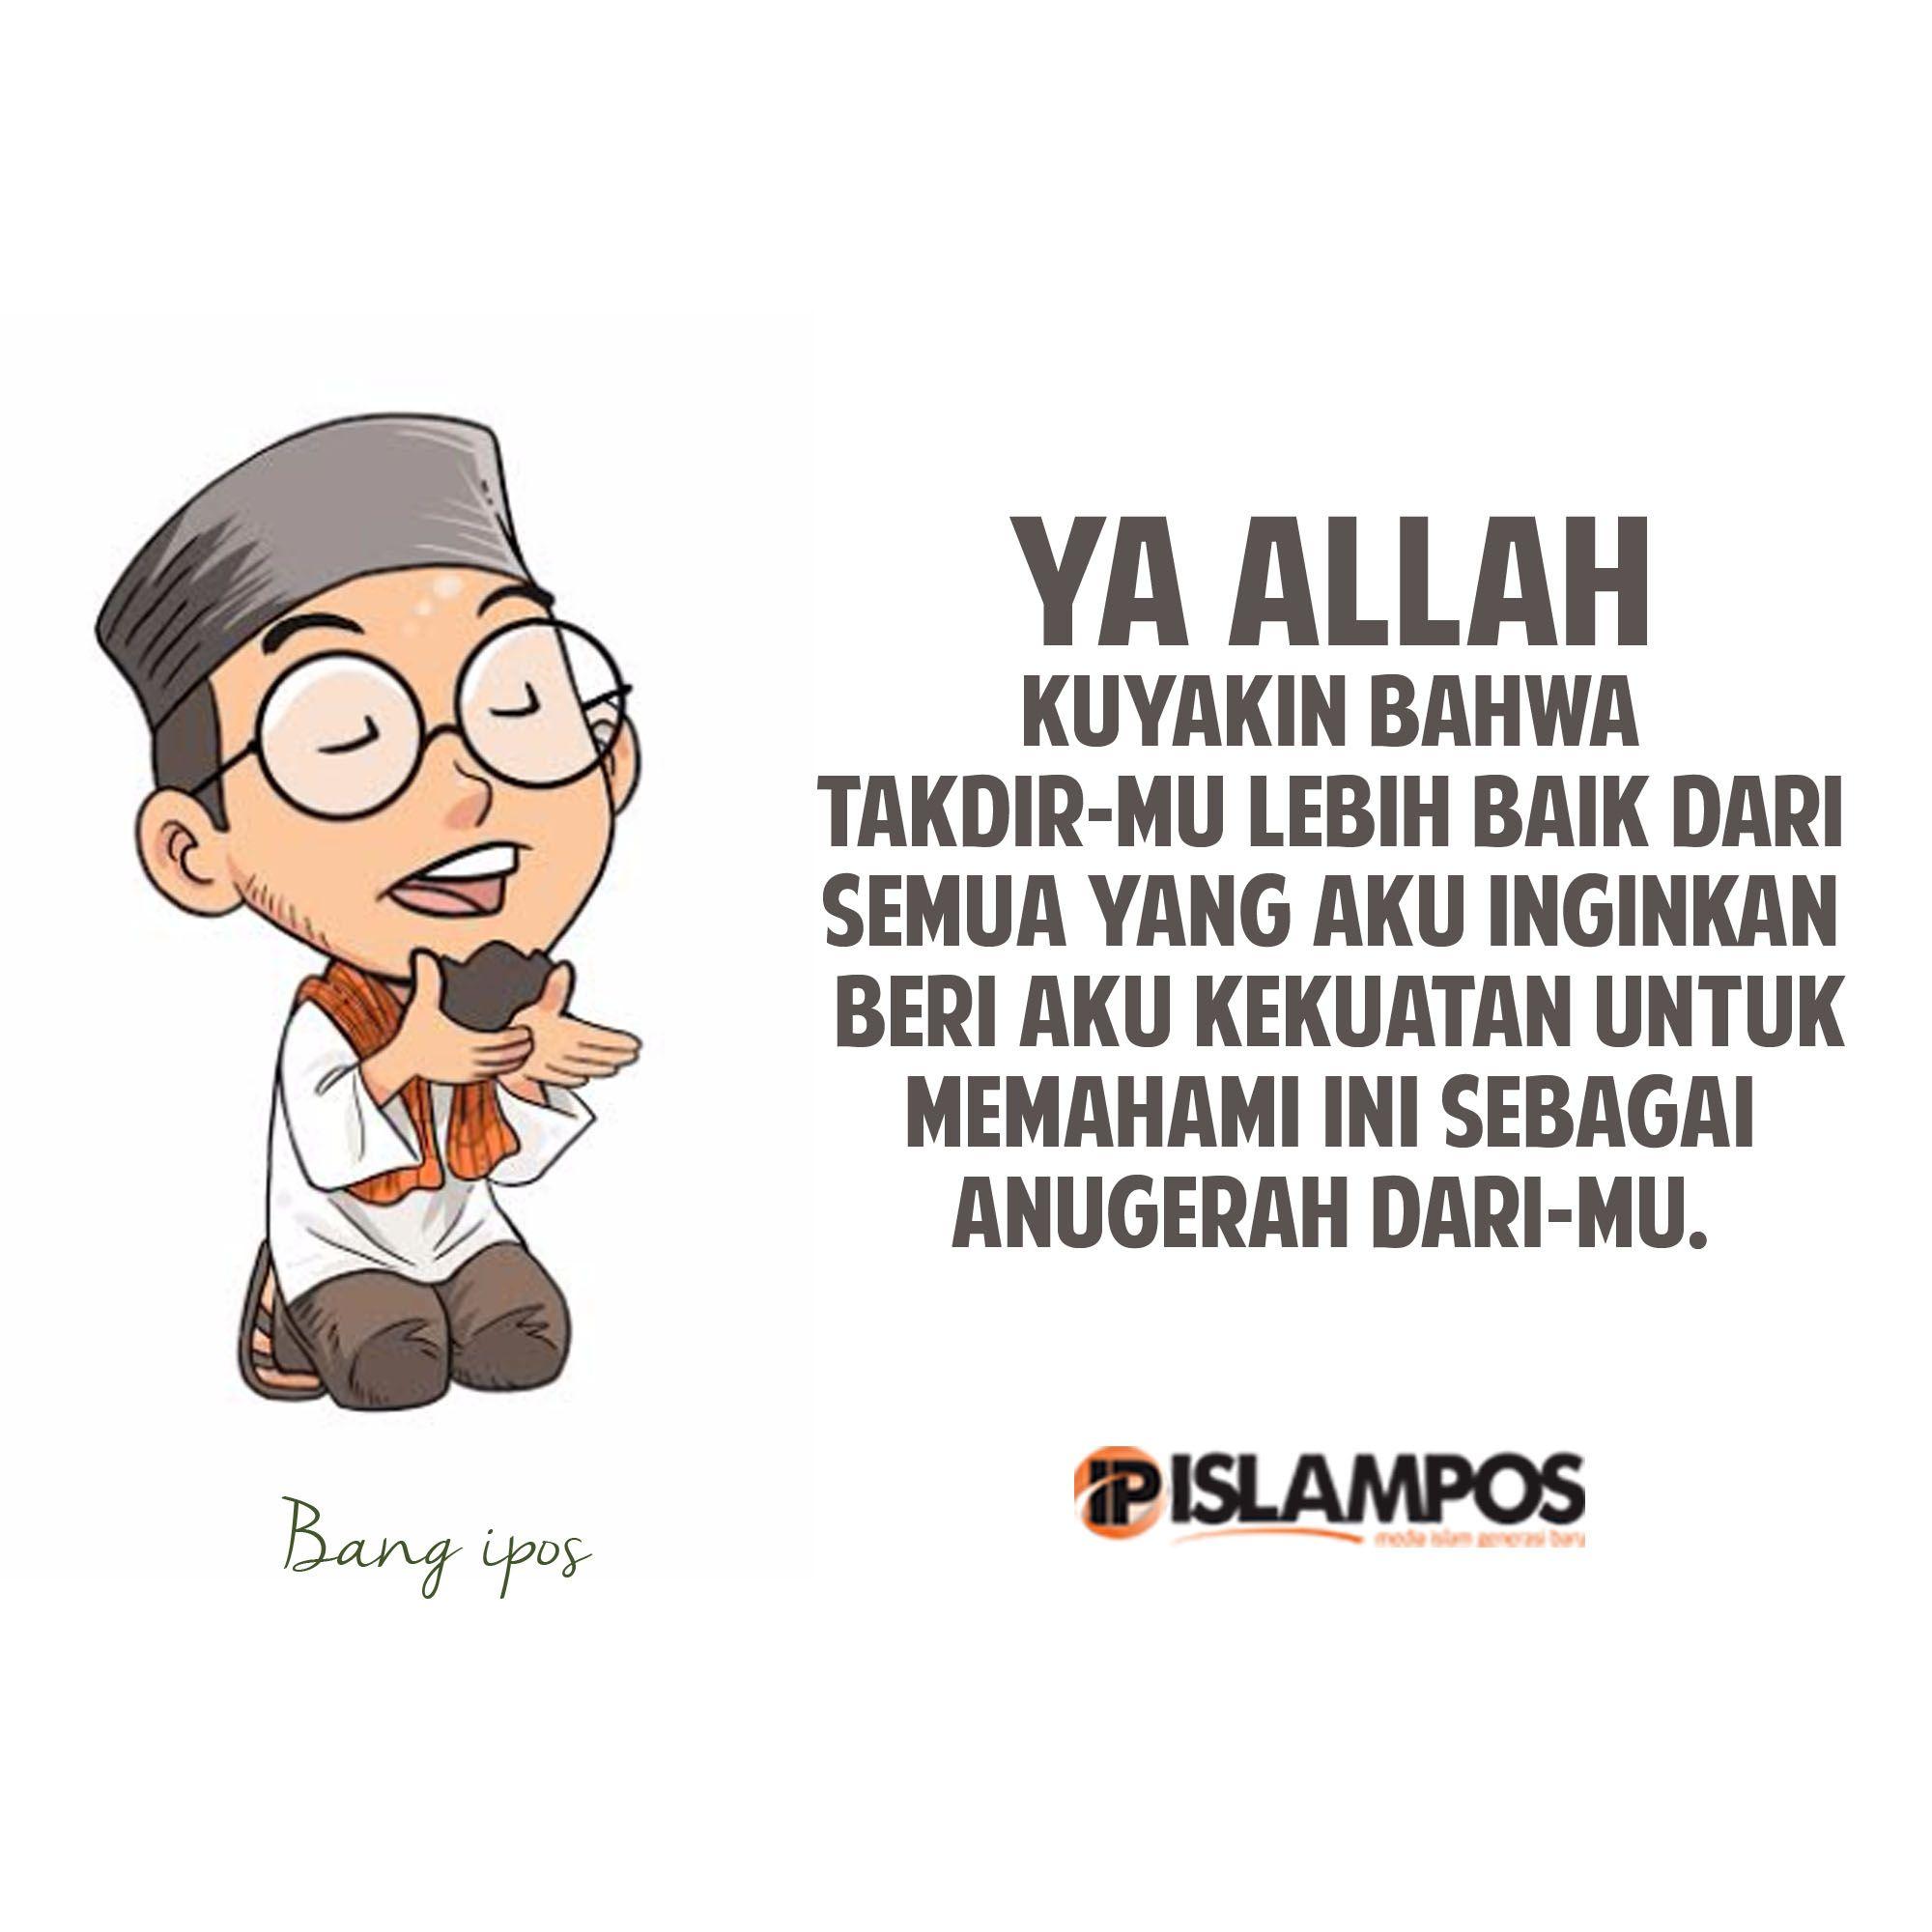 Ya Allah Kuyakin Takdirmu Lebih Baik Islamic Quotes Takdir